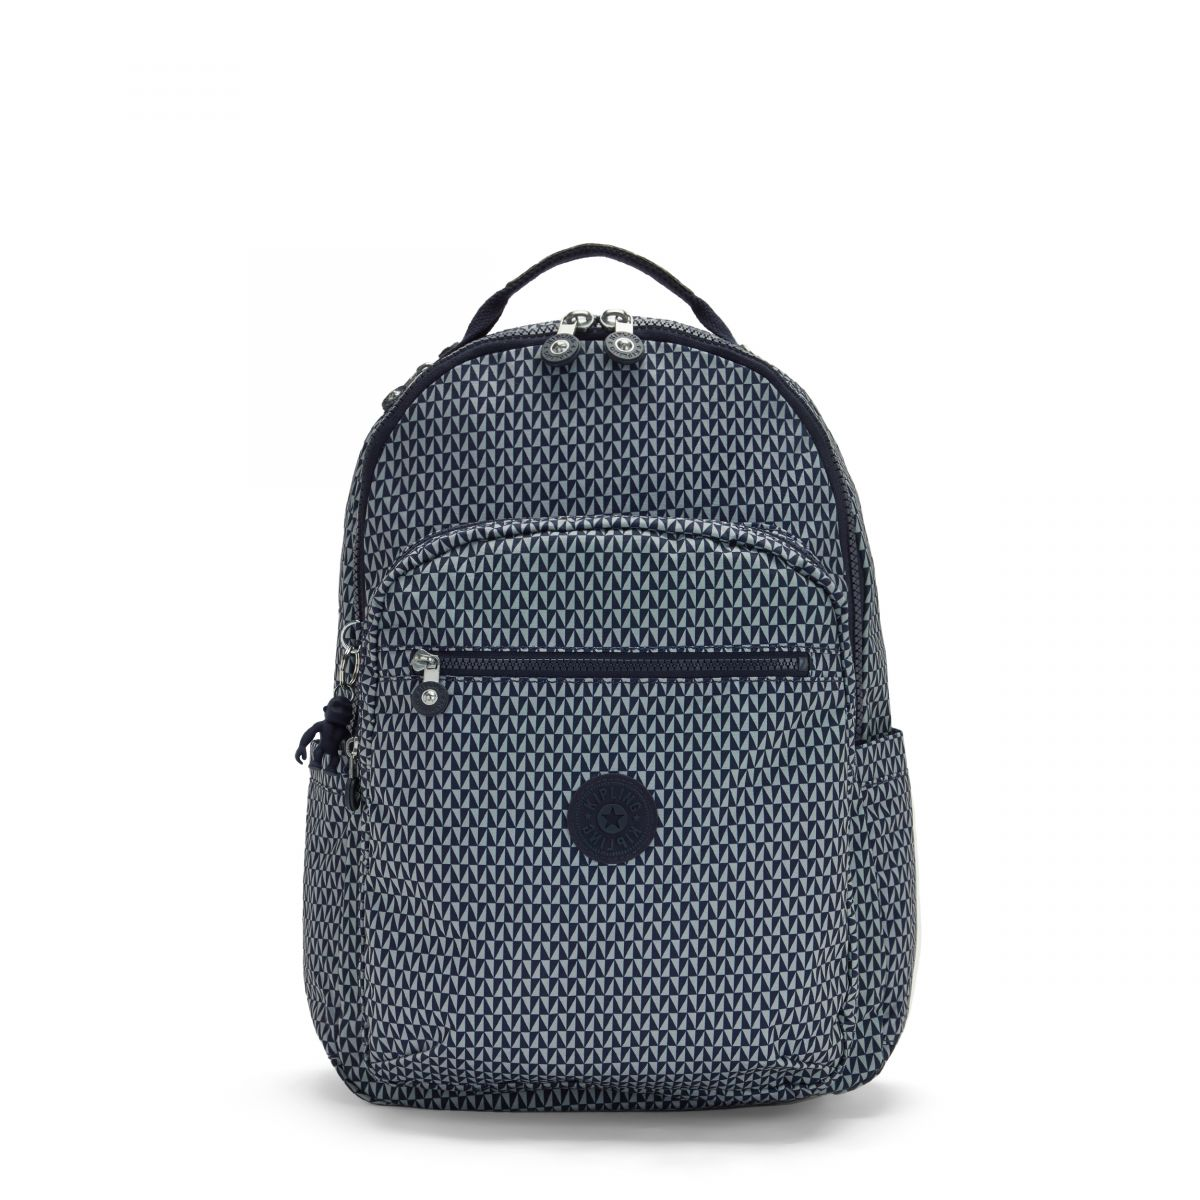 SEOUL SCHOOL BAGS by Kipling - Front view